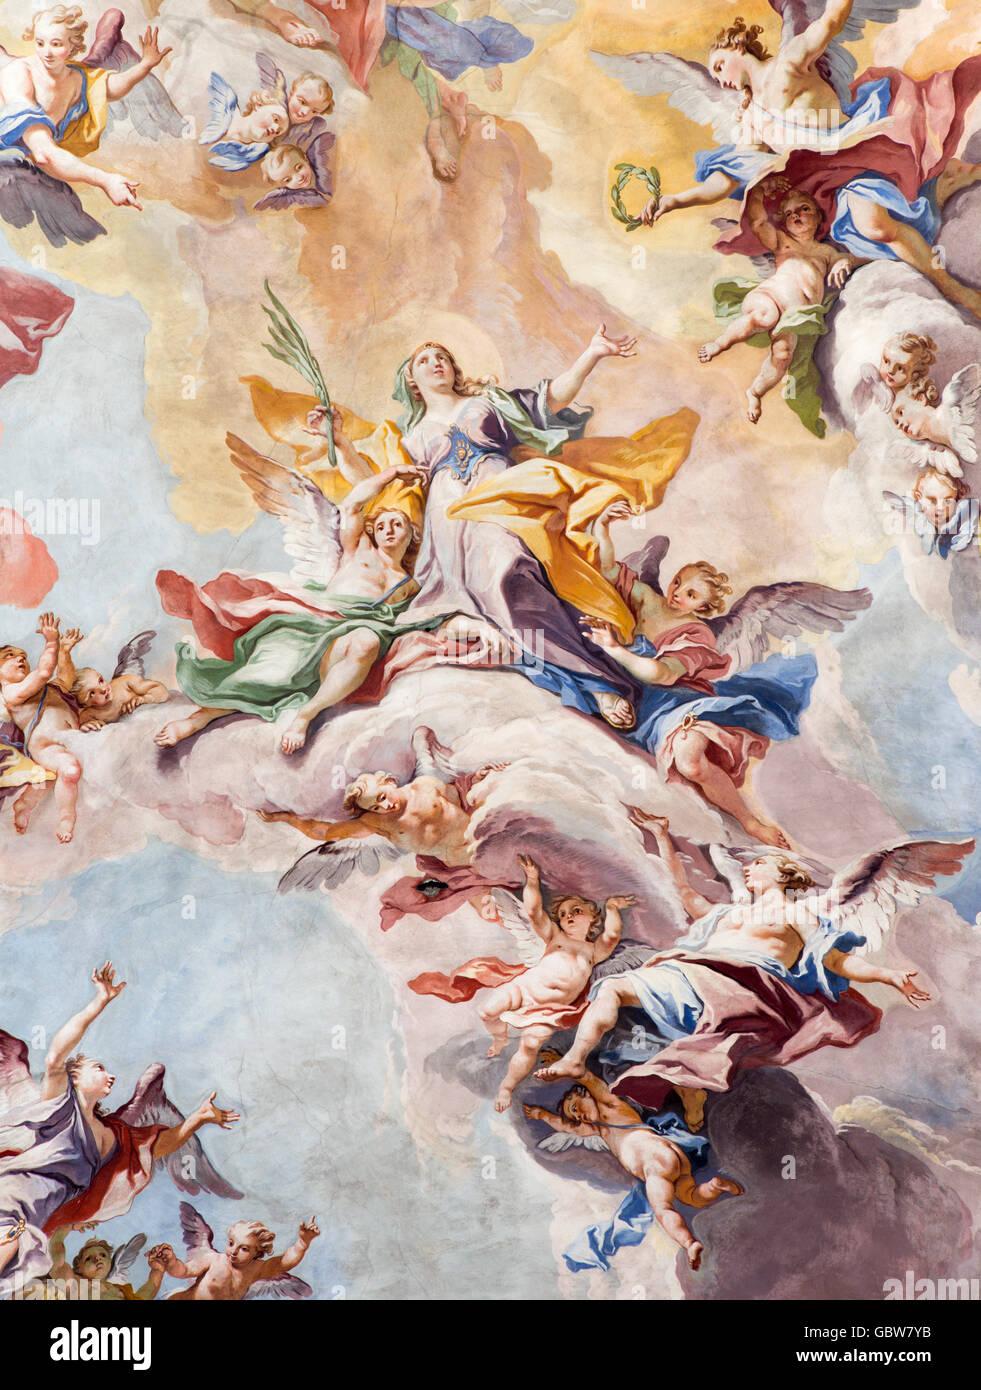 BRESCIA, ITALY - MAY 23, 2016: The Glory of Santa Eufemia fresco on the wault of presbytery of Sant'Afra church - Stock Image